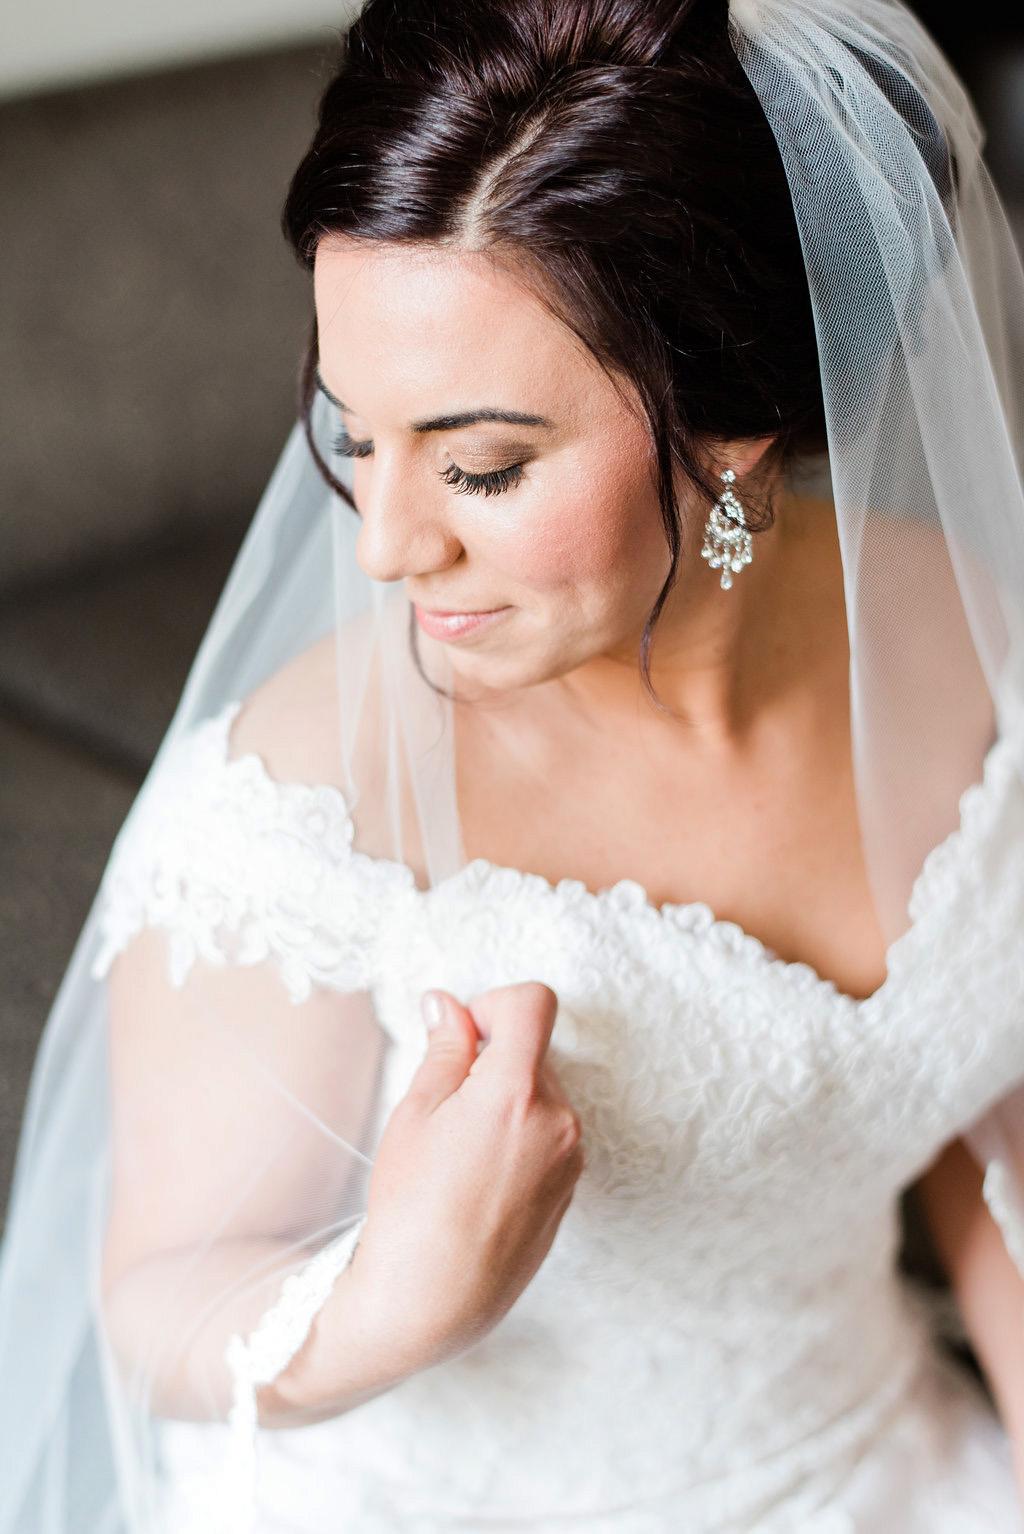 brown-eyes-natural-spring-wedding-bridal-makeup (26).jpg